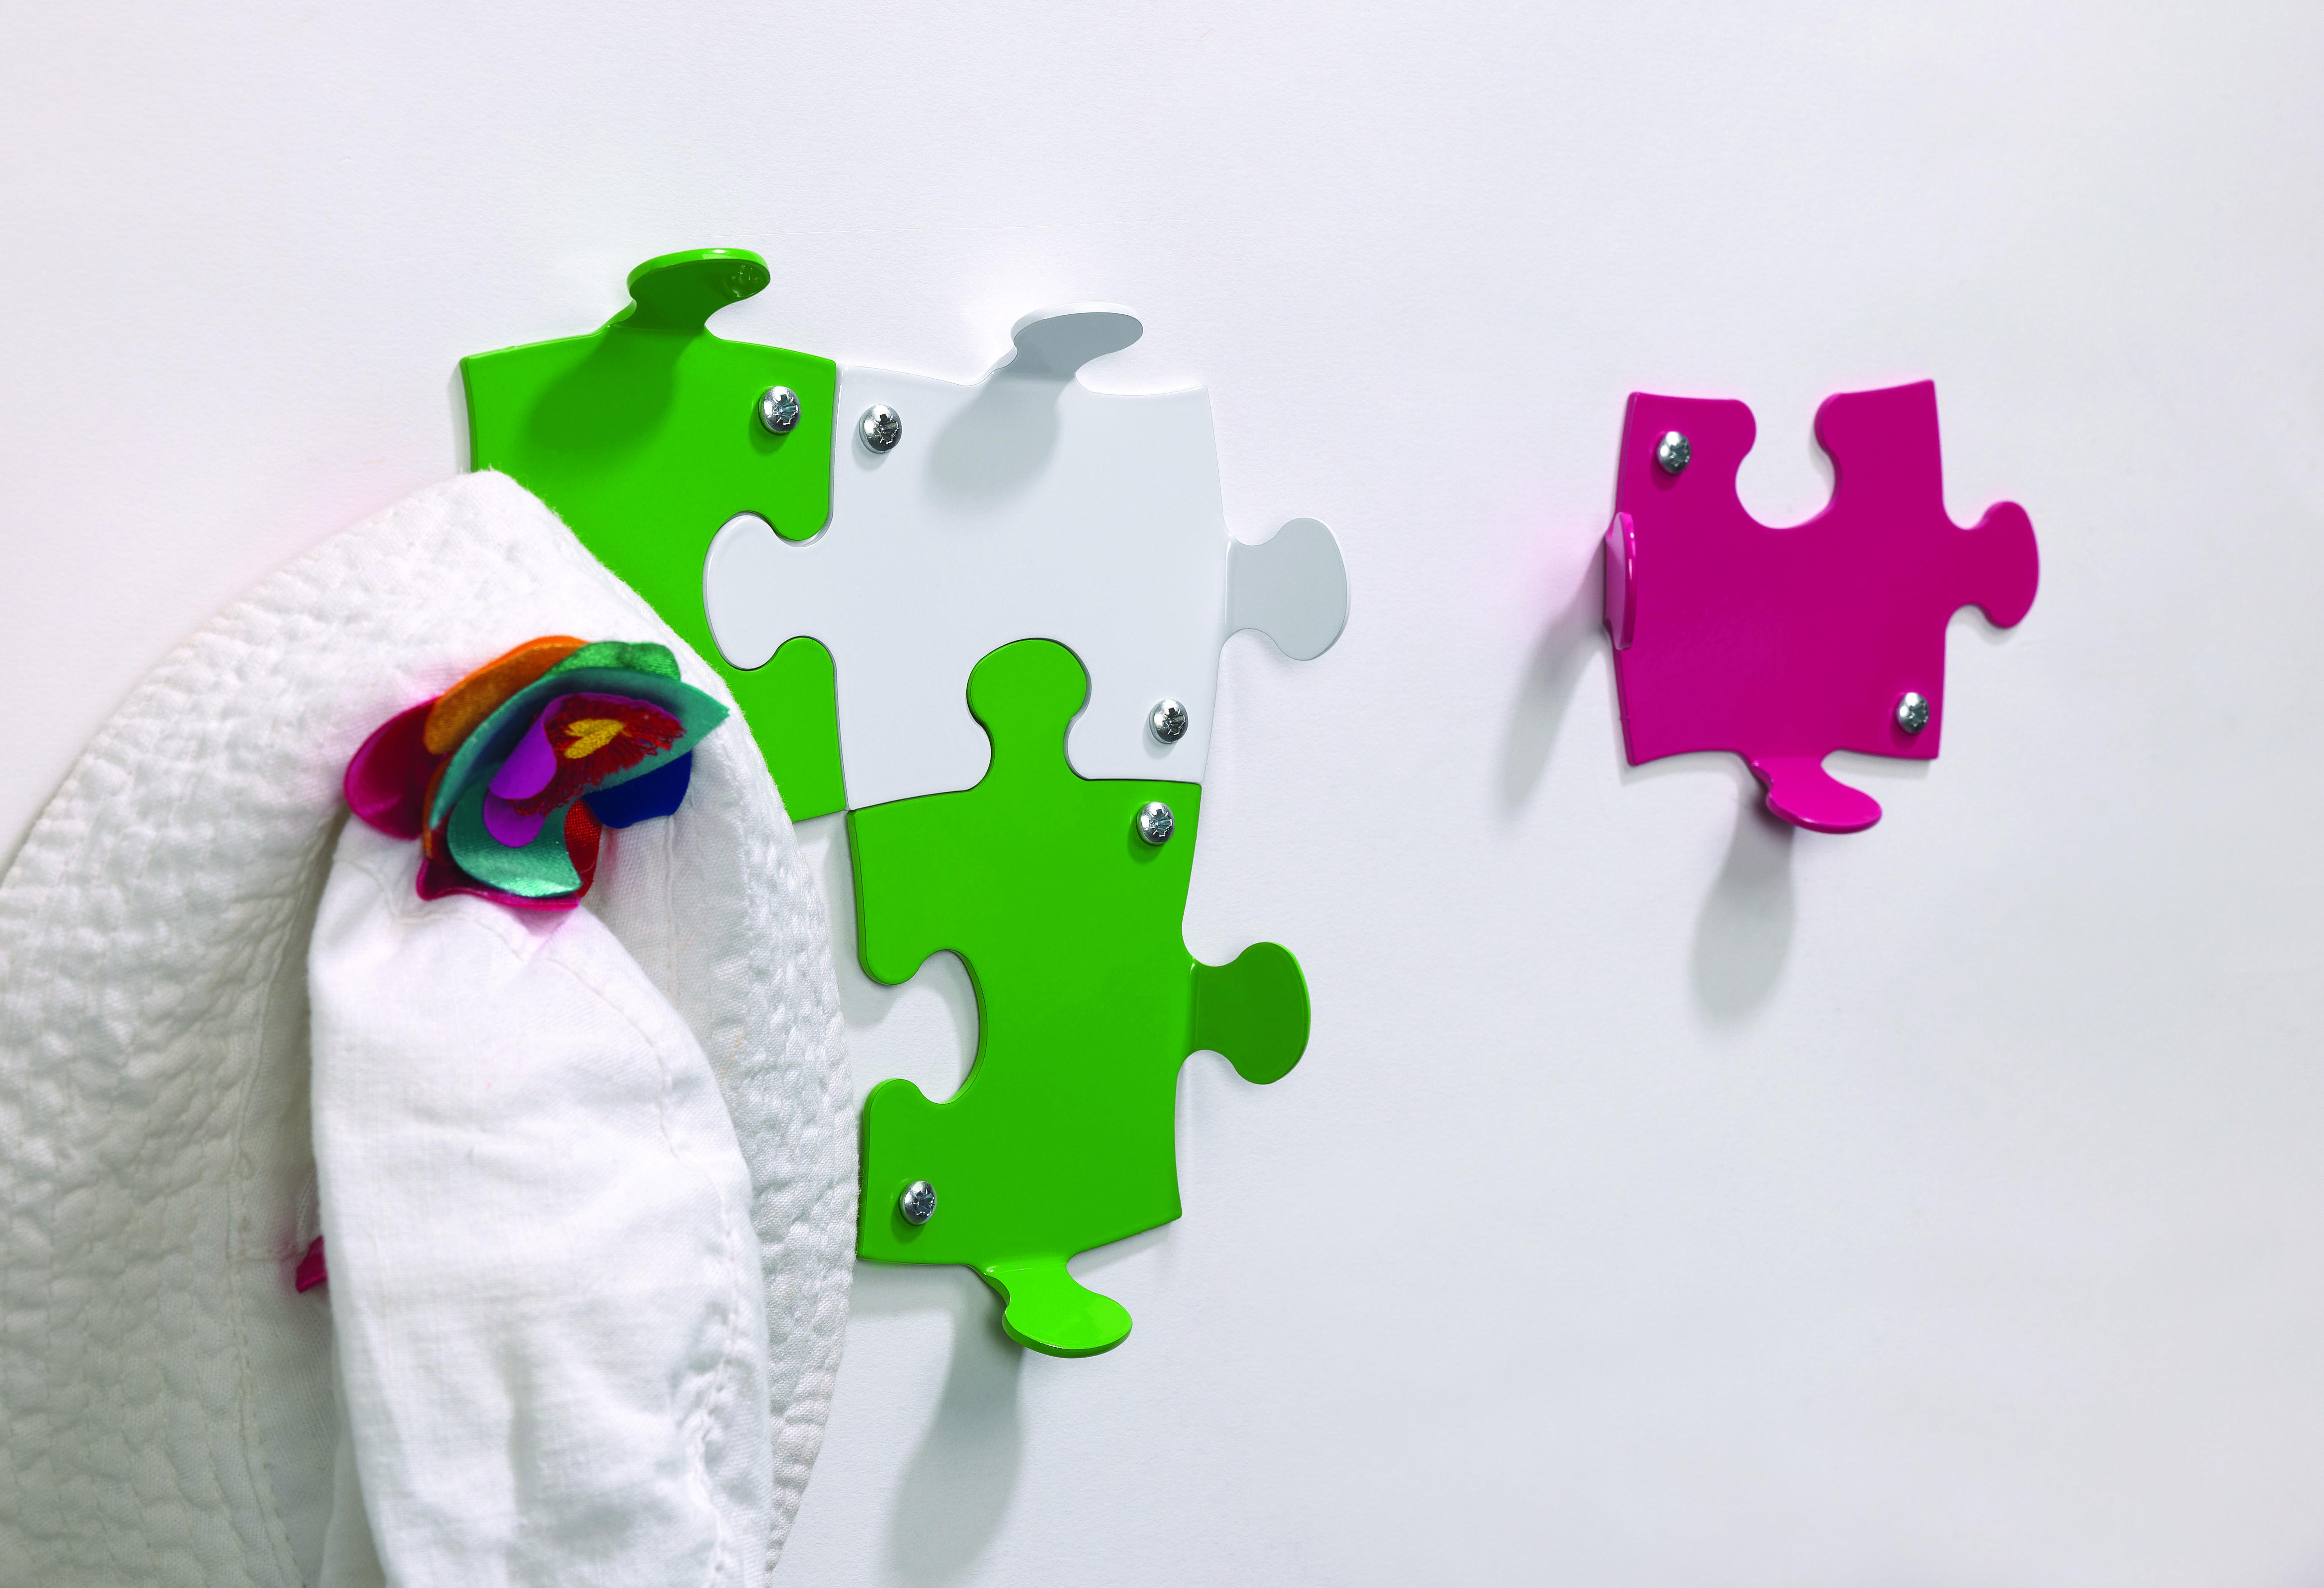 Ganci Appendini.Puzzle Design Coat Hook Appendiabiti Appendiabito Appendini